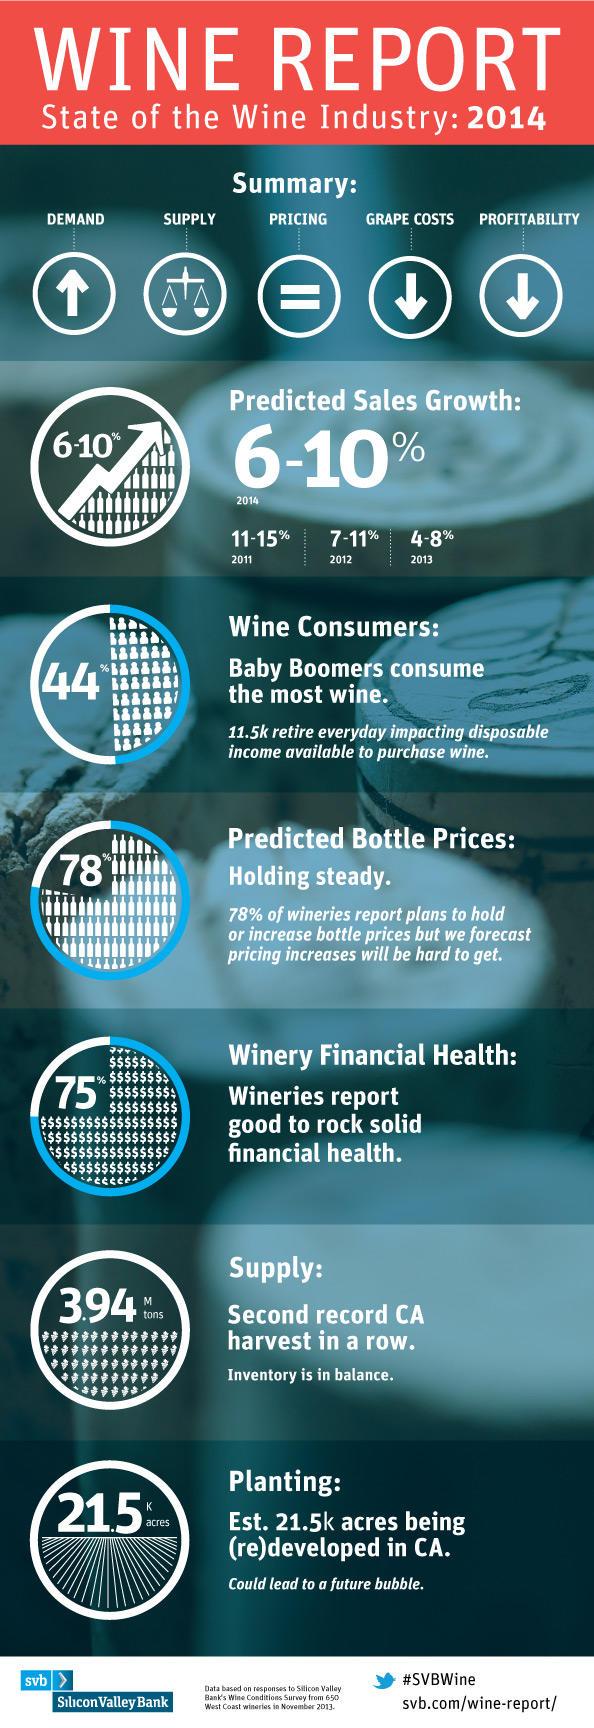 infographic-wine-report-2014